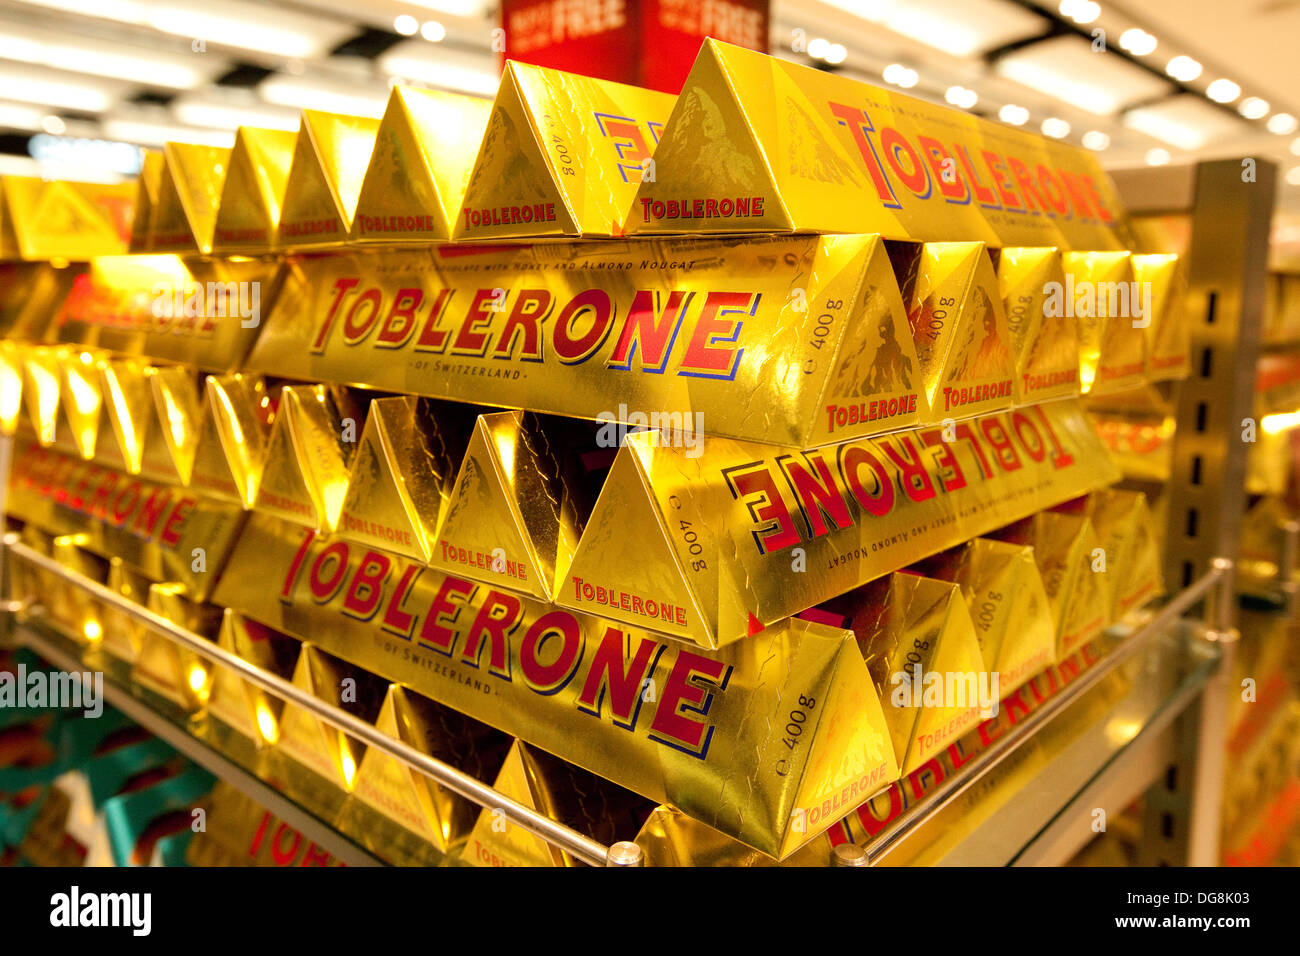 Toblerone Chocolate Stock Photos & Toblerone Chocolate Stock ...